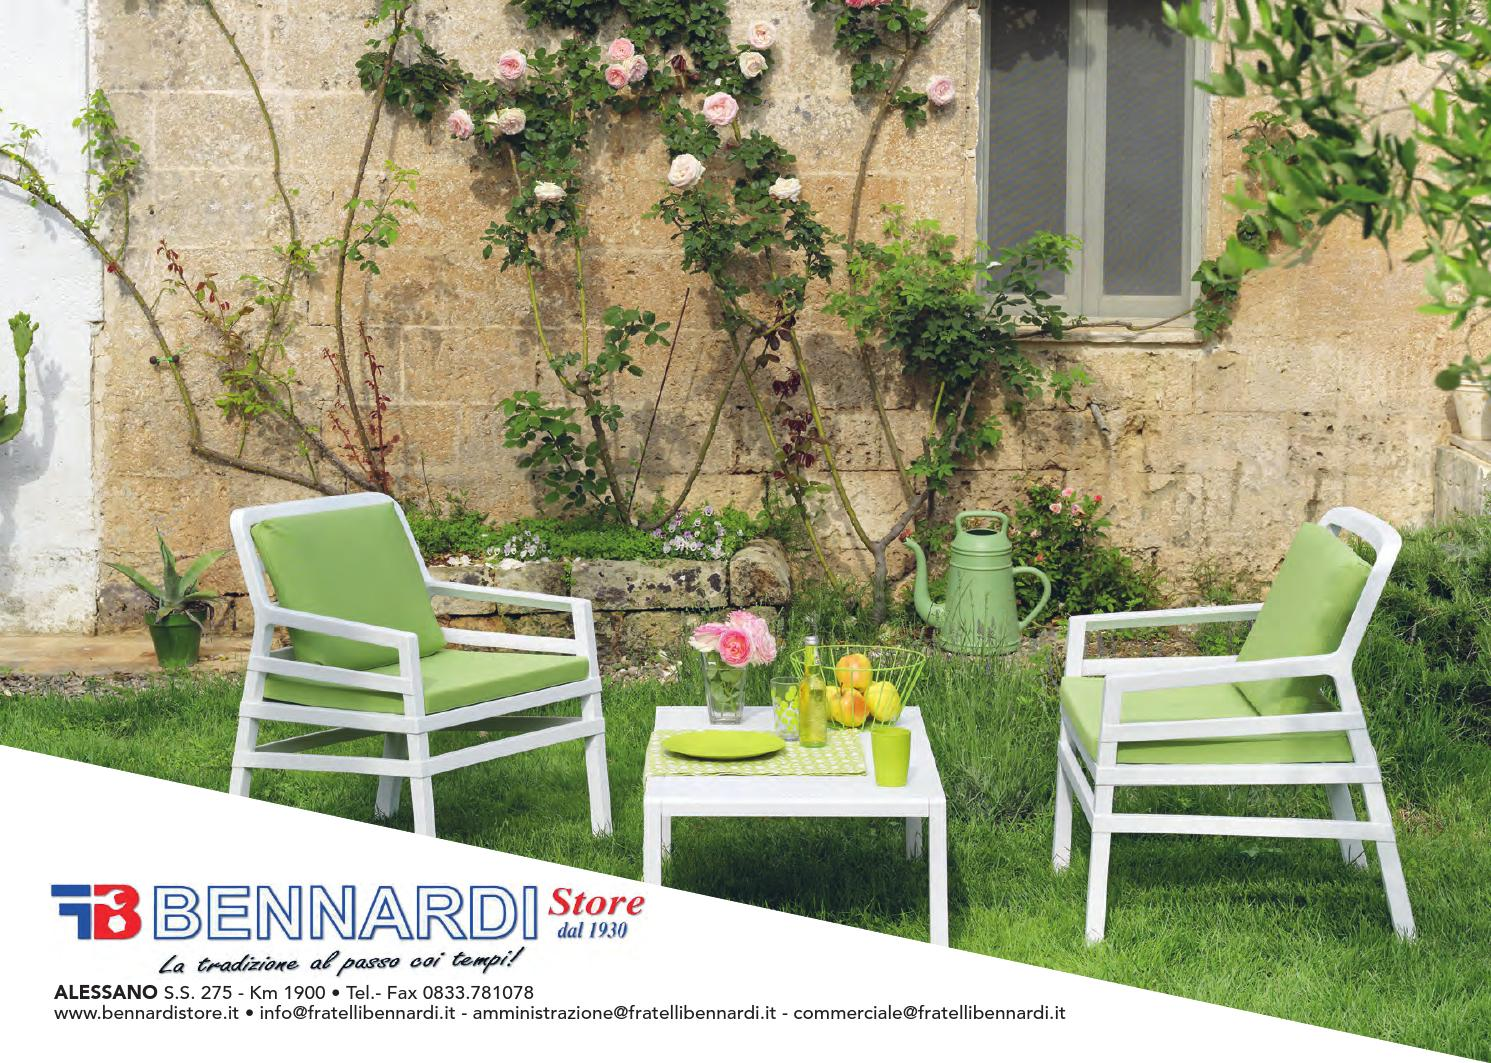 Catalogo arredo giardino bennardi 2016 by bennardi issuu for Catalogo arredo giardino